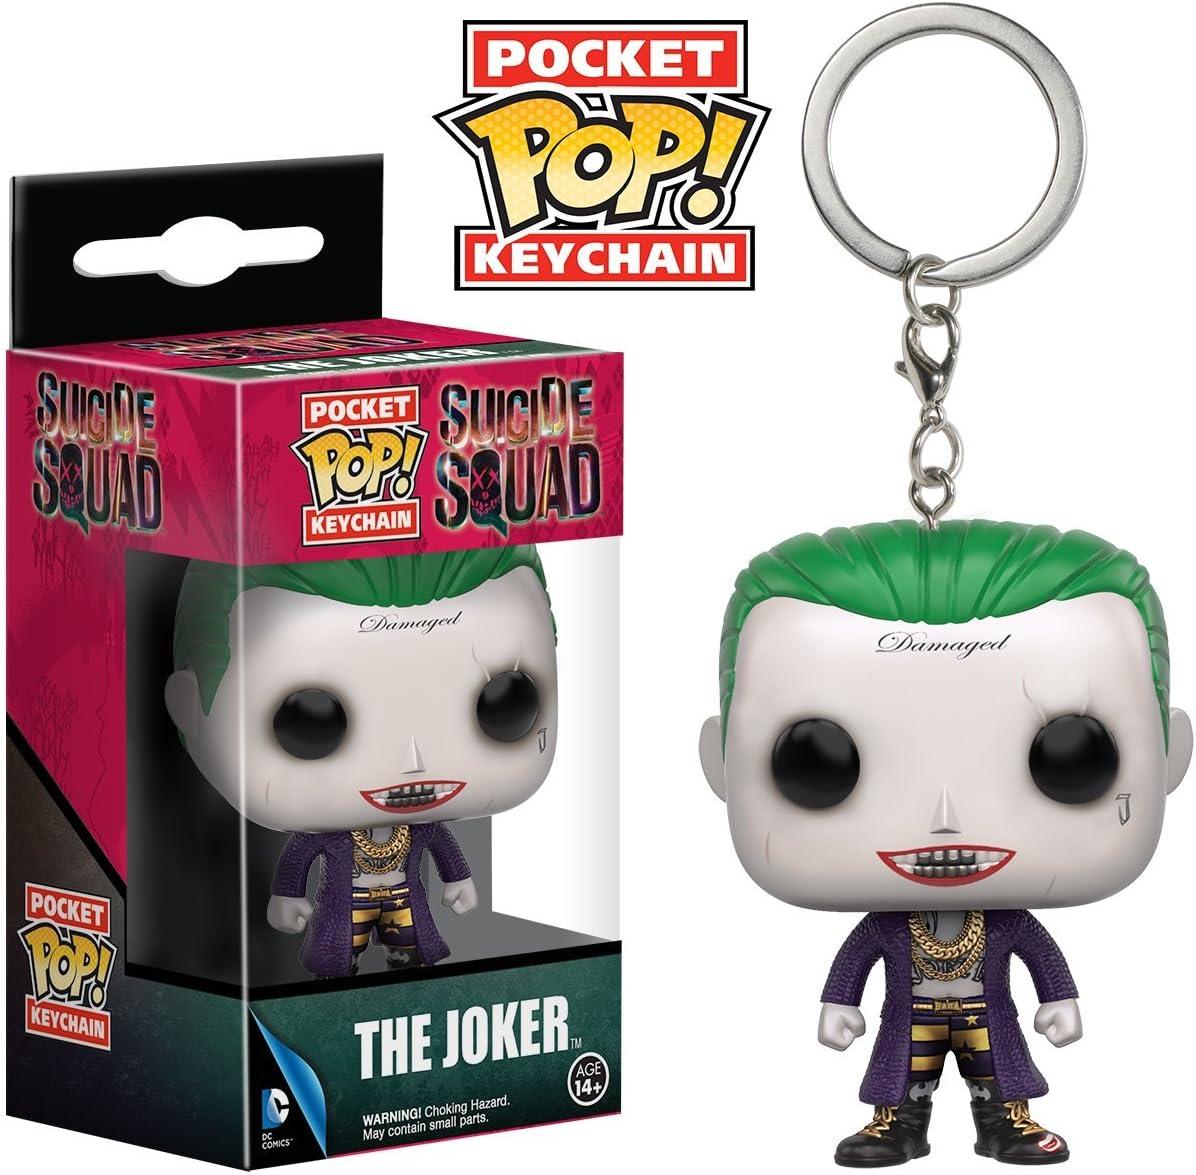 Funko pocket pop action figure keychain portachiavi Suicide Squad The Joker